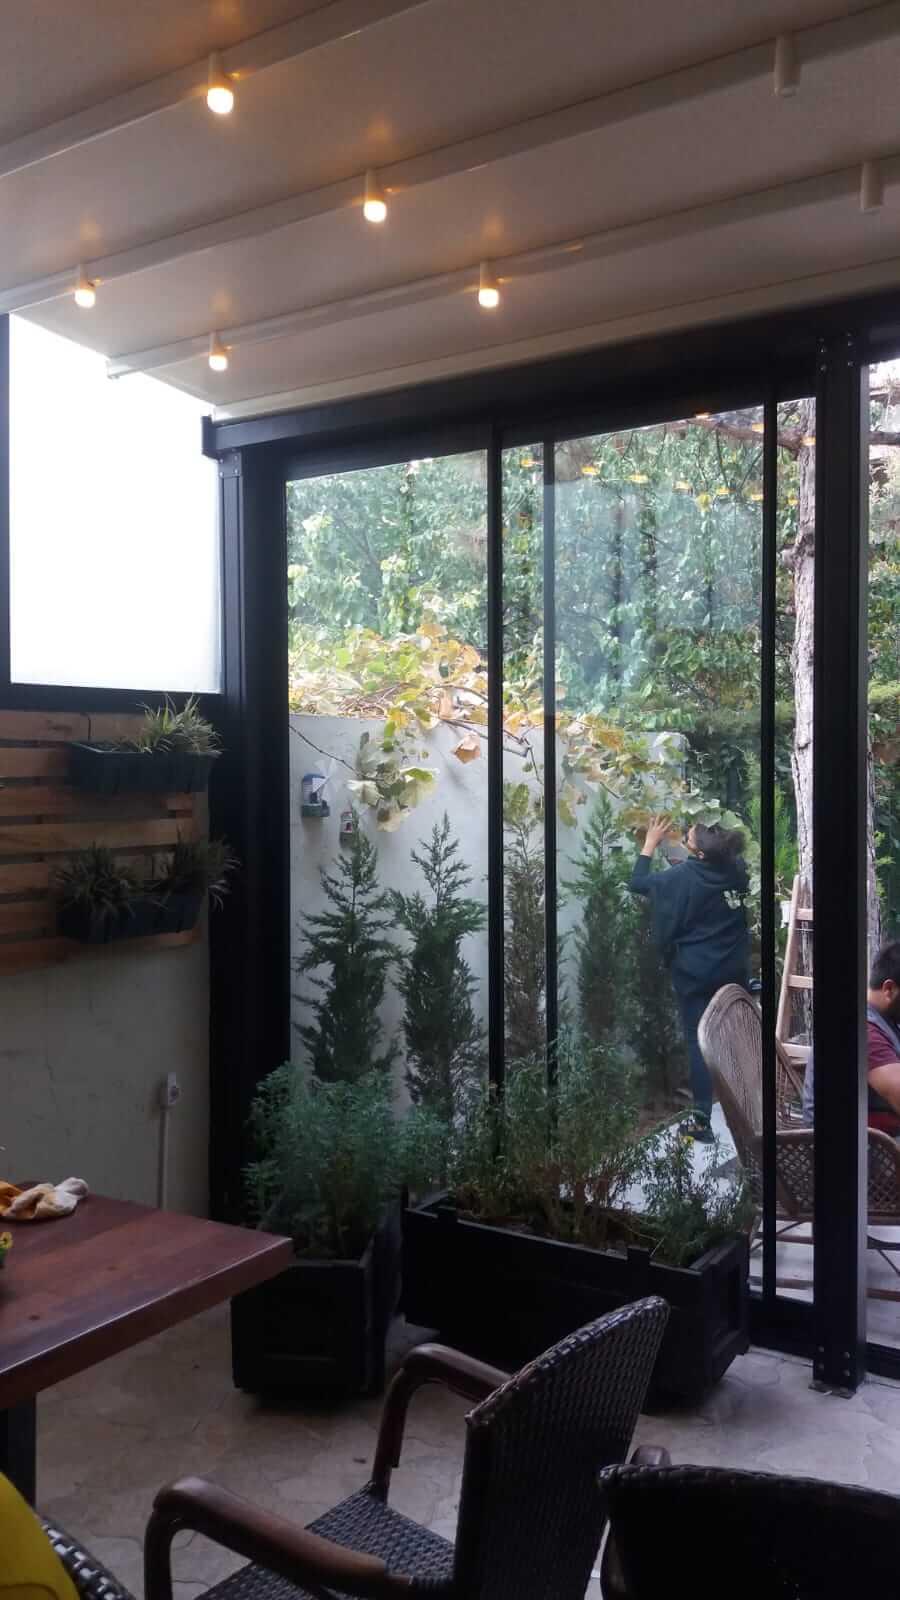 Ankara Oran Sürme Seri Cam Balkon Sistemleri